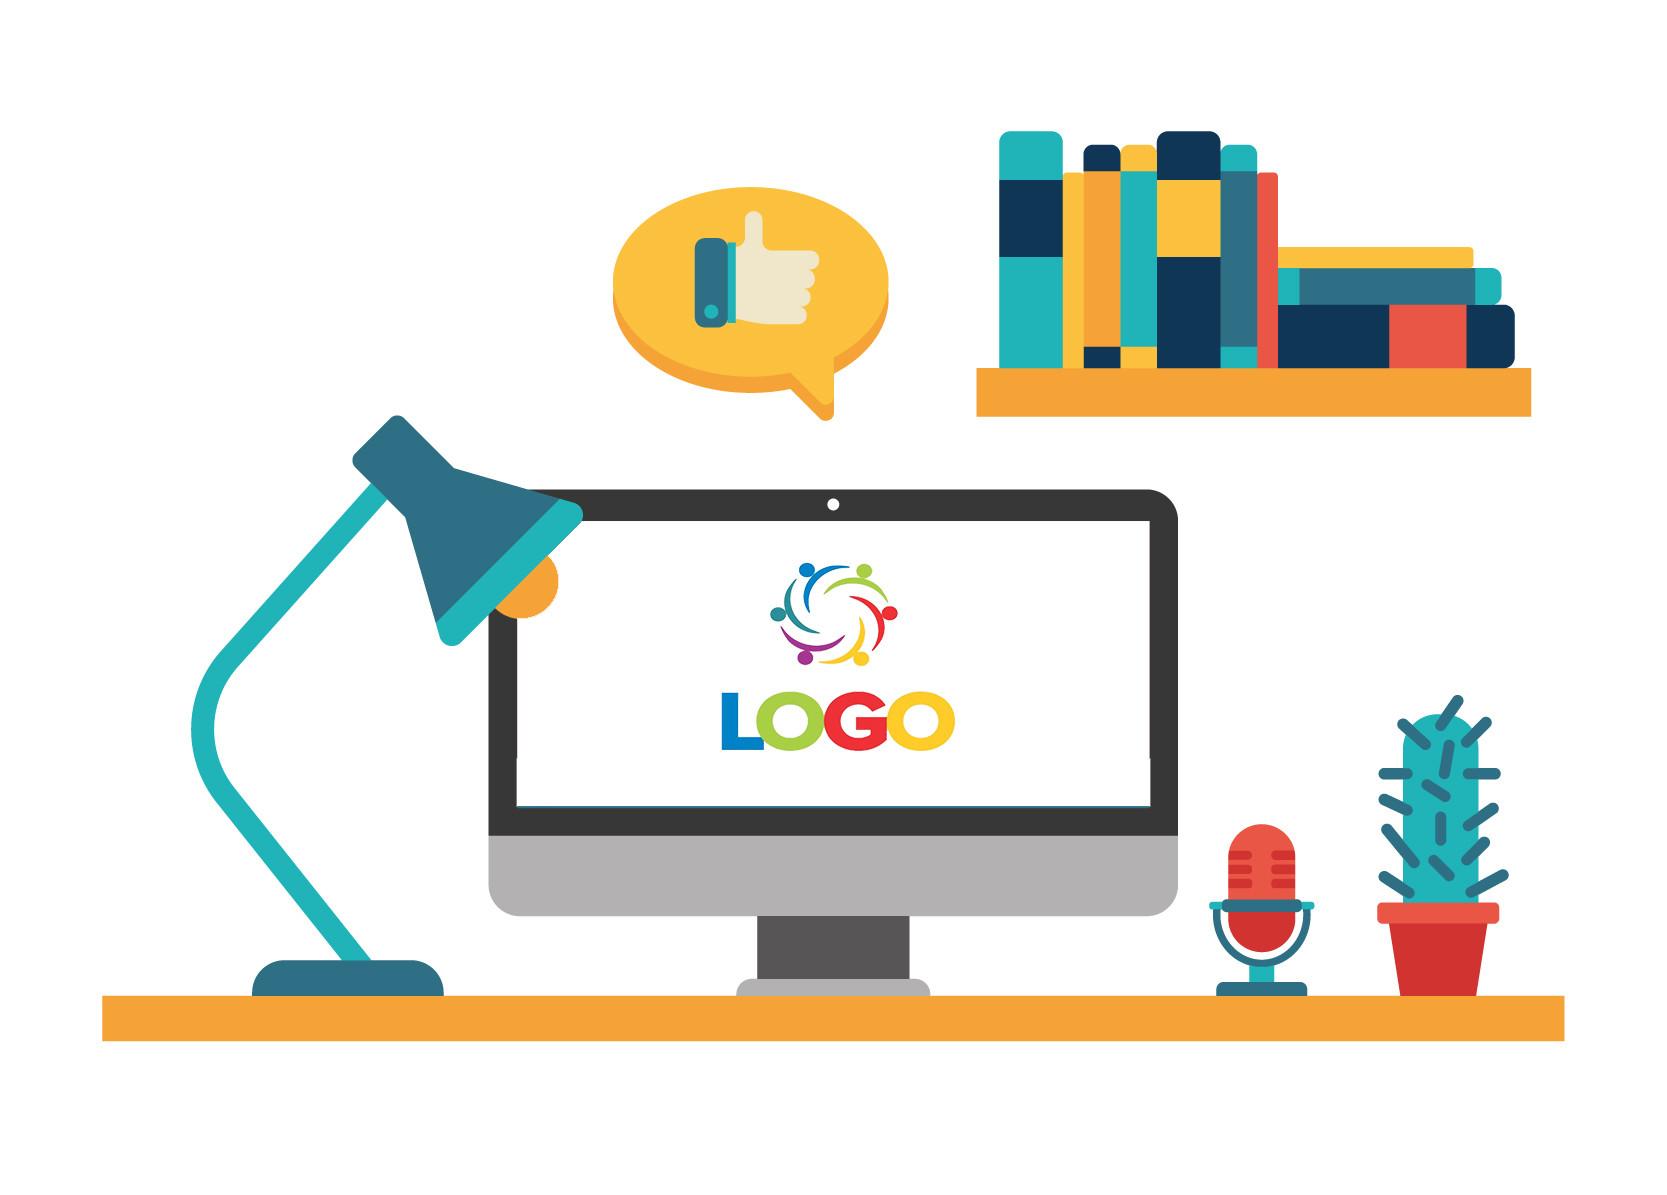 logotipos de marcas - logos para empresas online